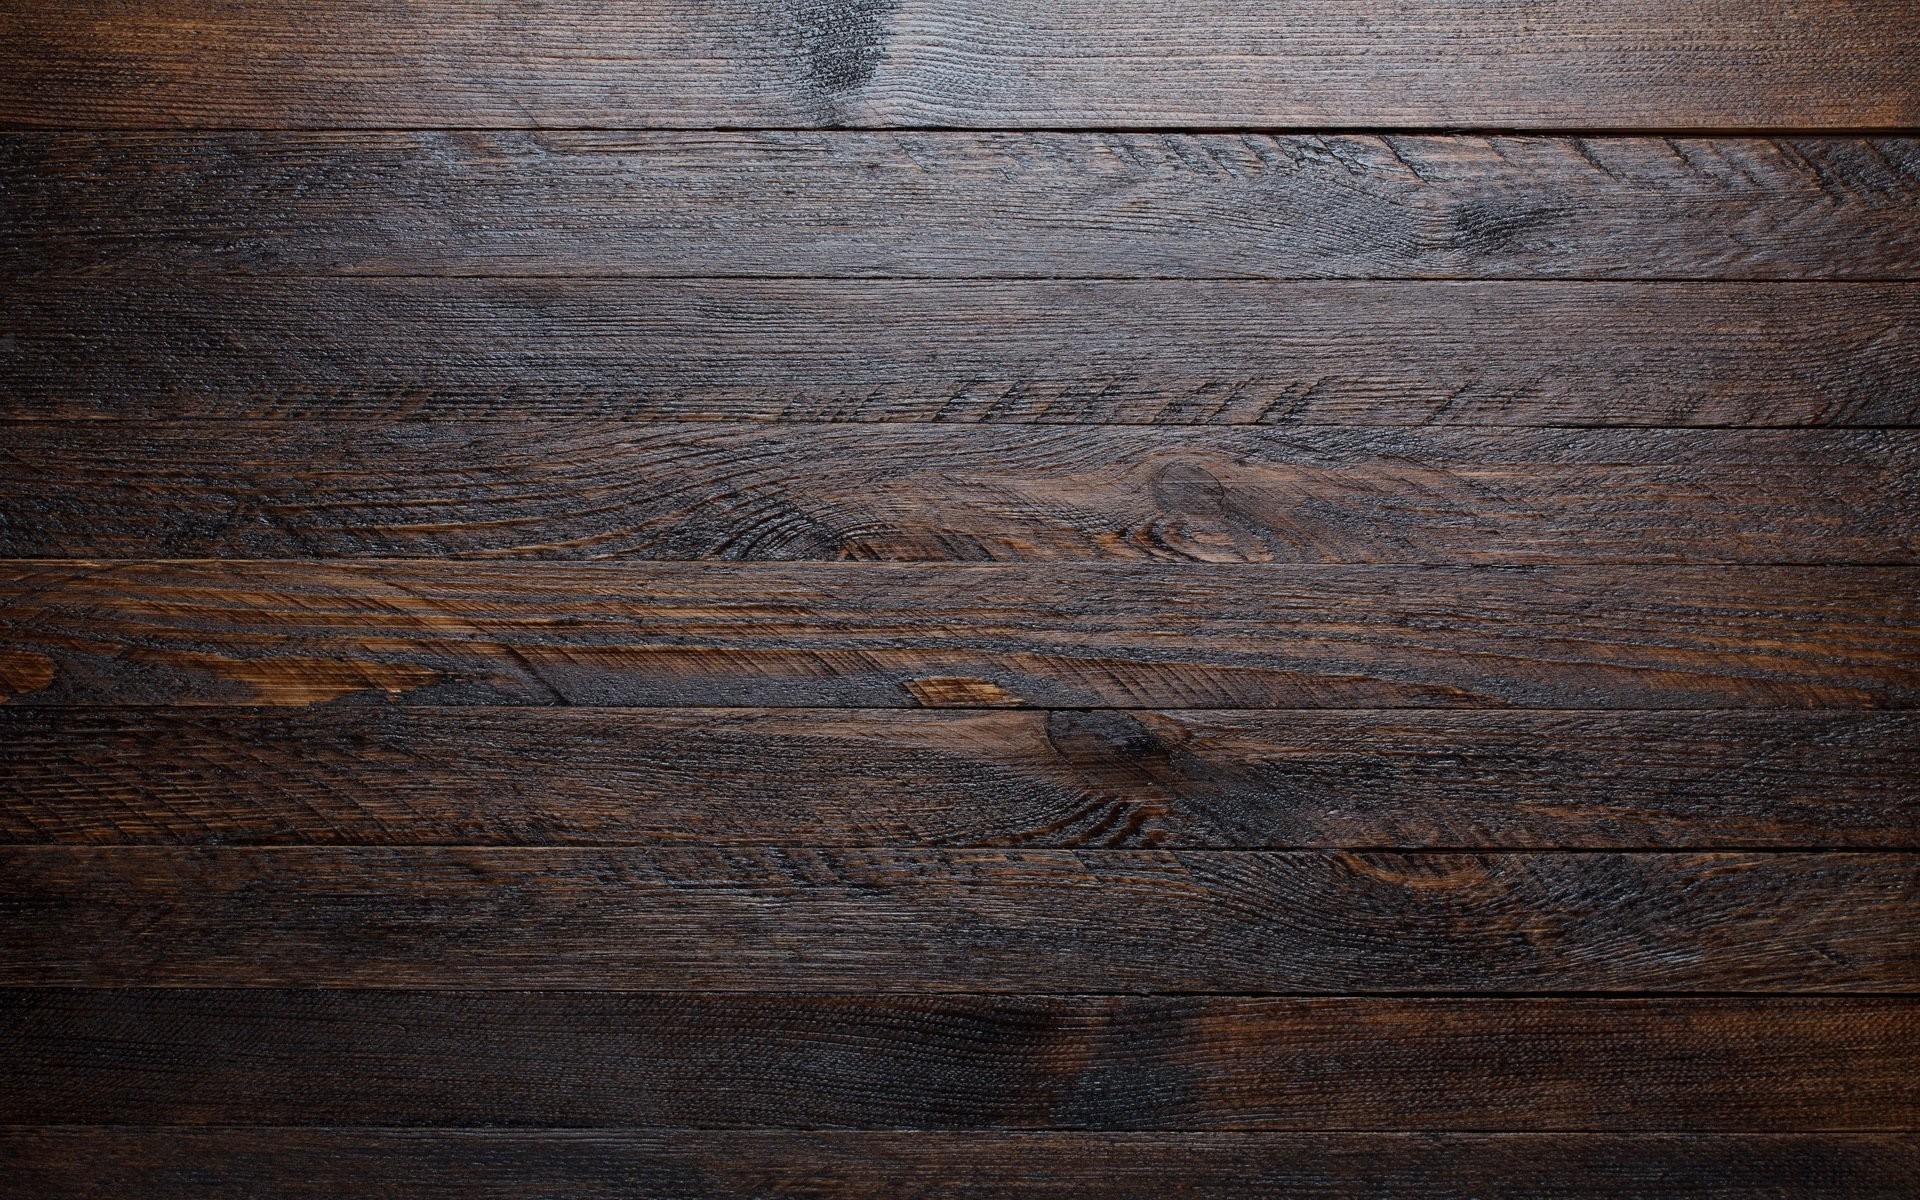 … rustic wood wallpaper iphone wallpaper hd …